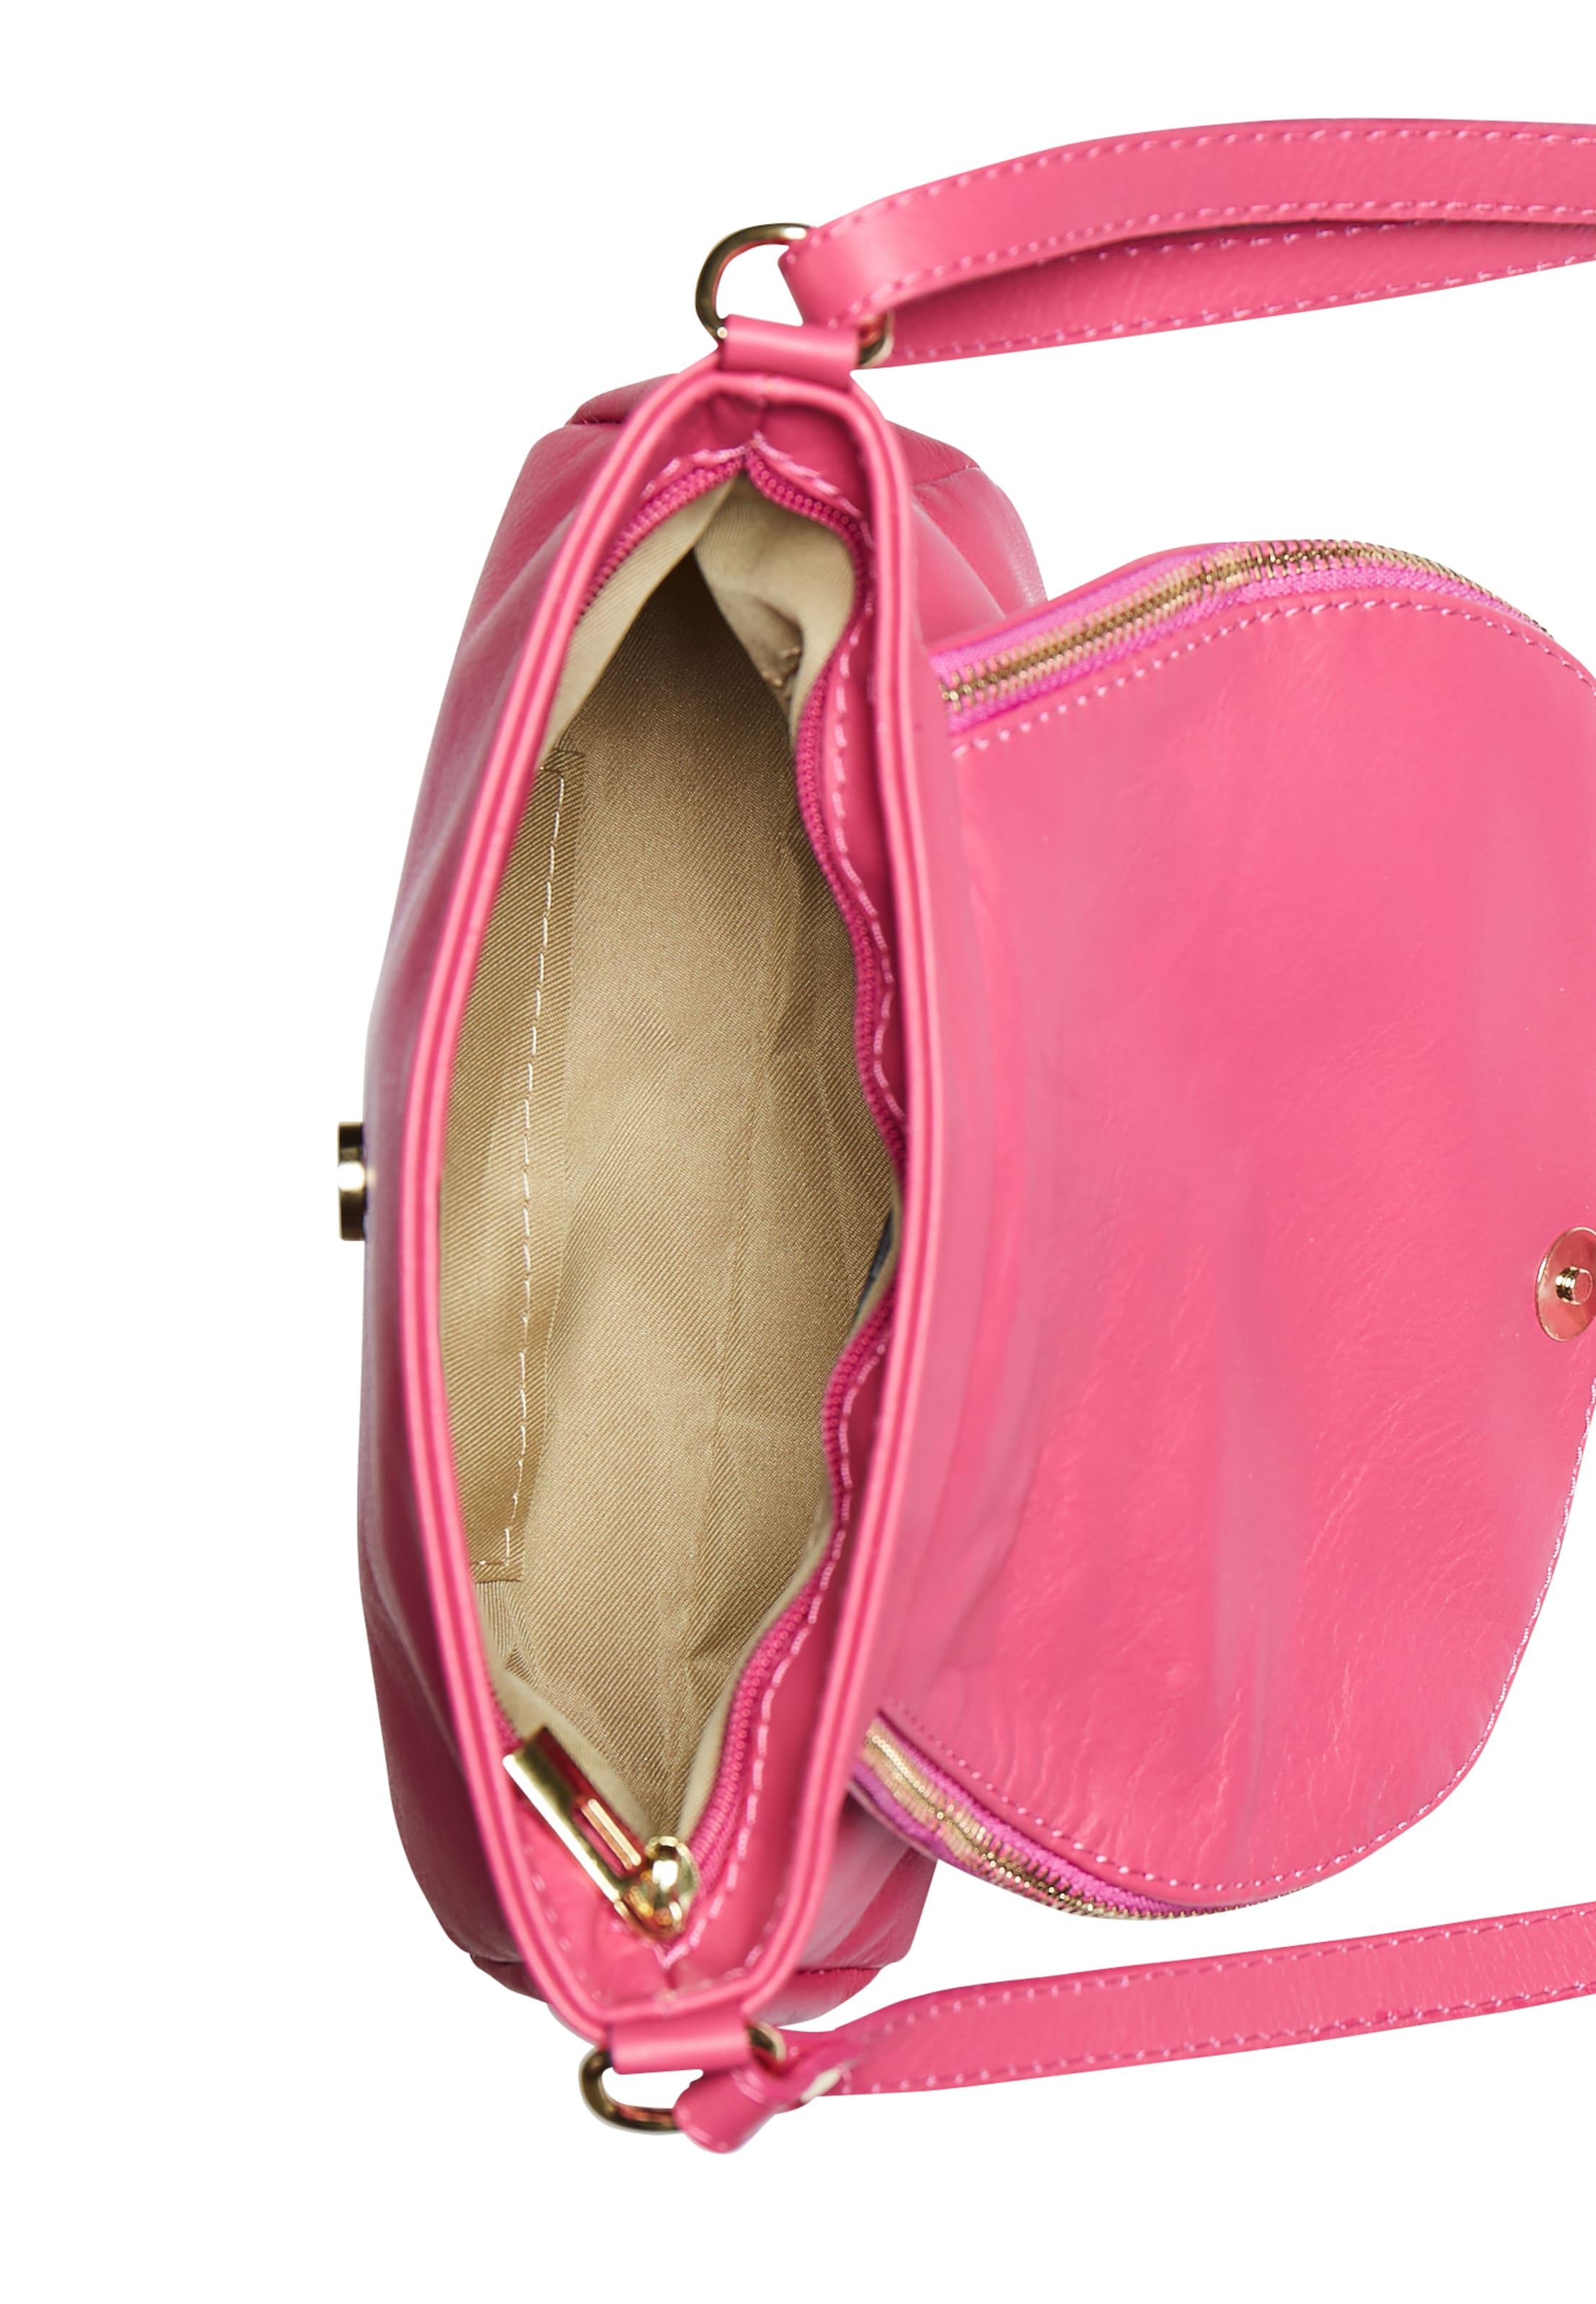 Pink Handtasche Handtasche Pink Mymo Pink Mymo In Mymo In Handtasche Mymo Handtasche In bg6yf7YIv